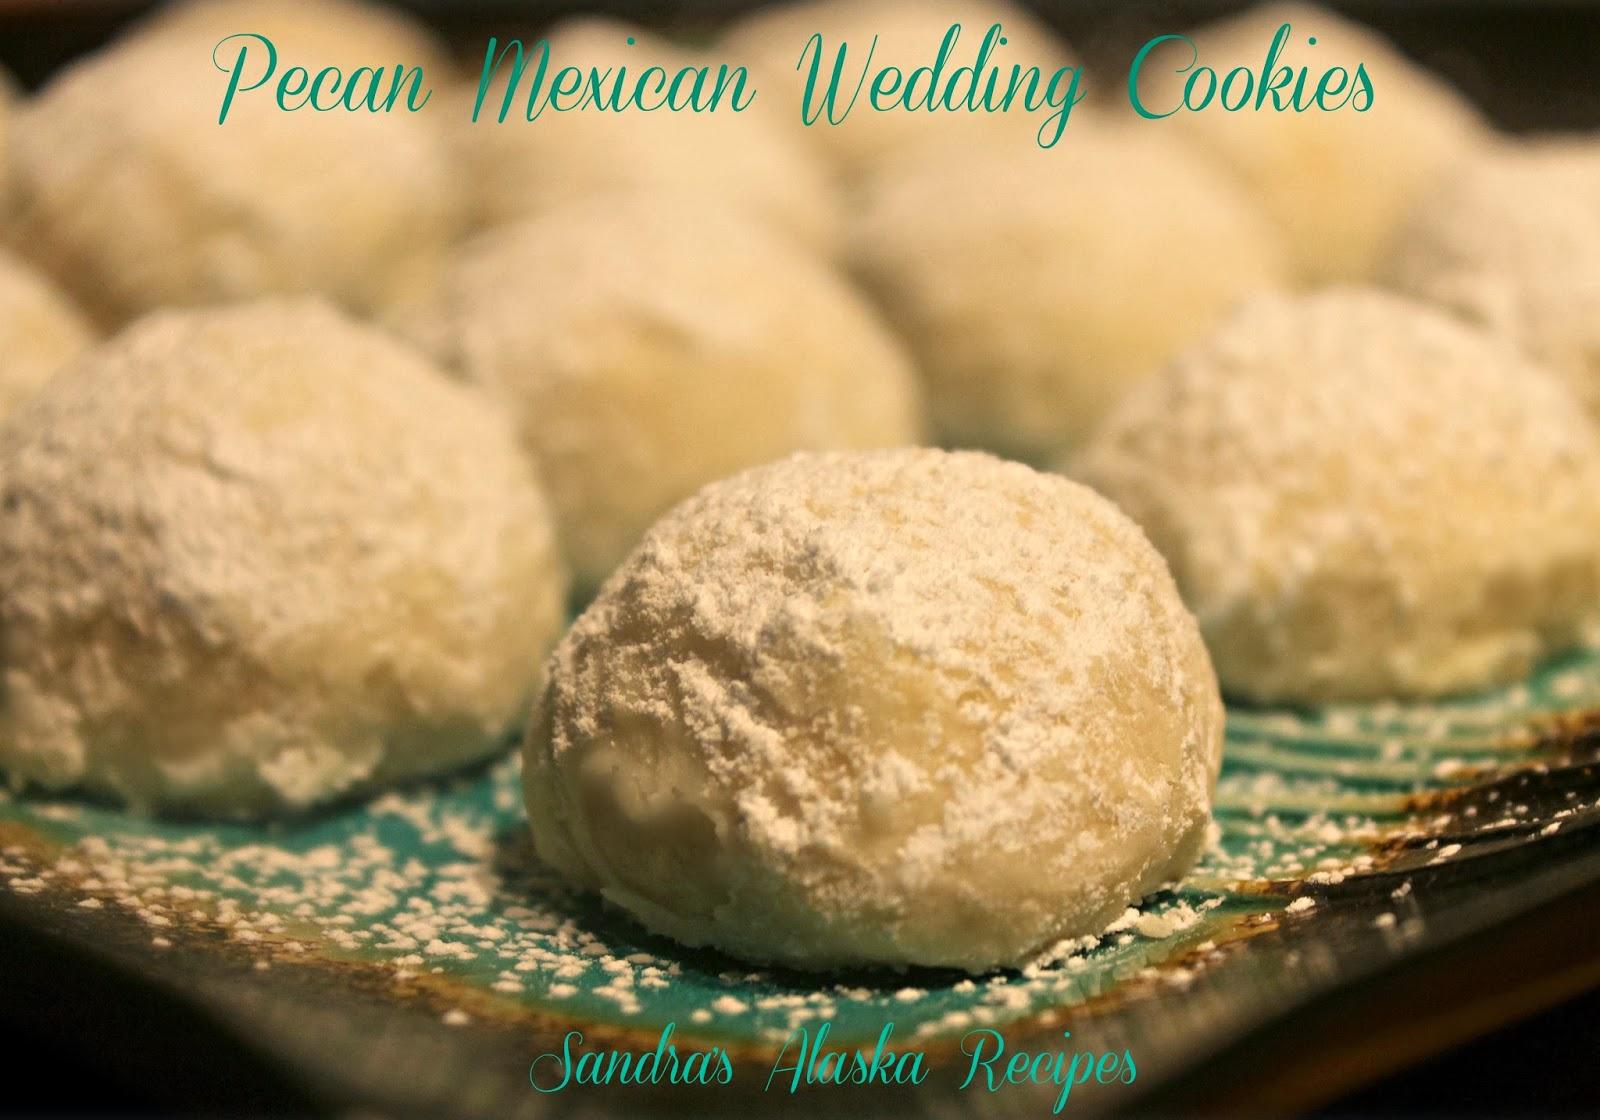 Sandra s alaska recipes sandra s pecan mexican wedding cookies